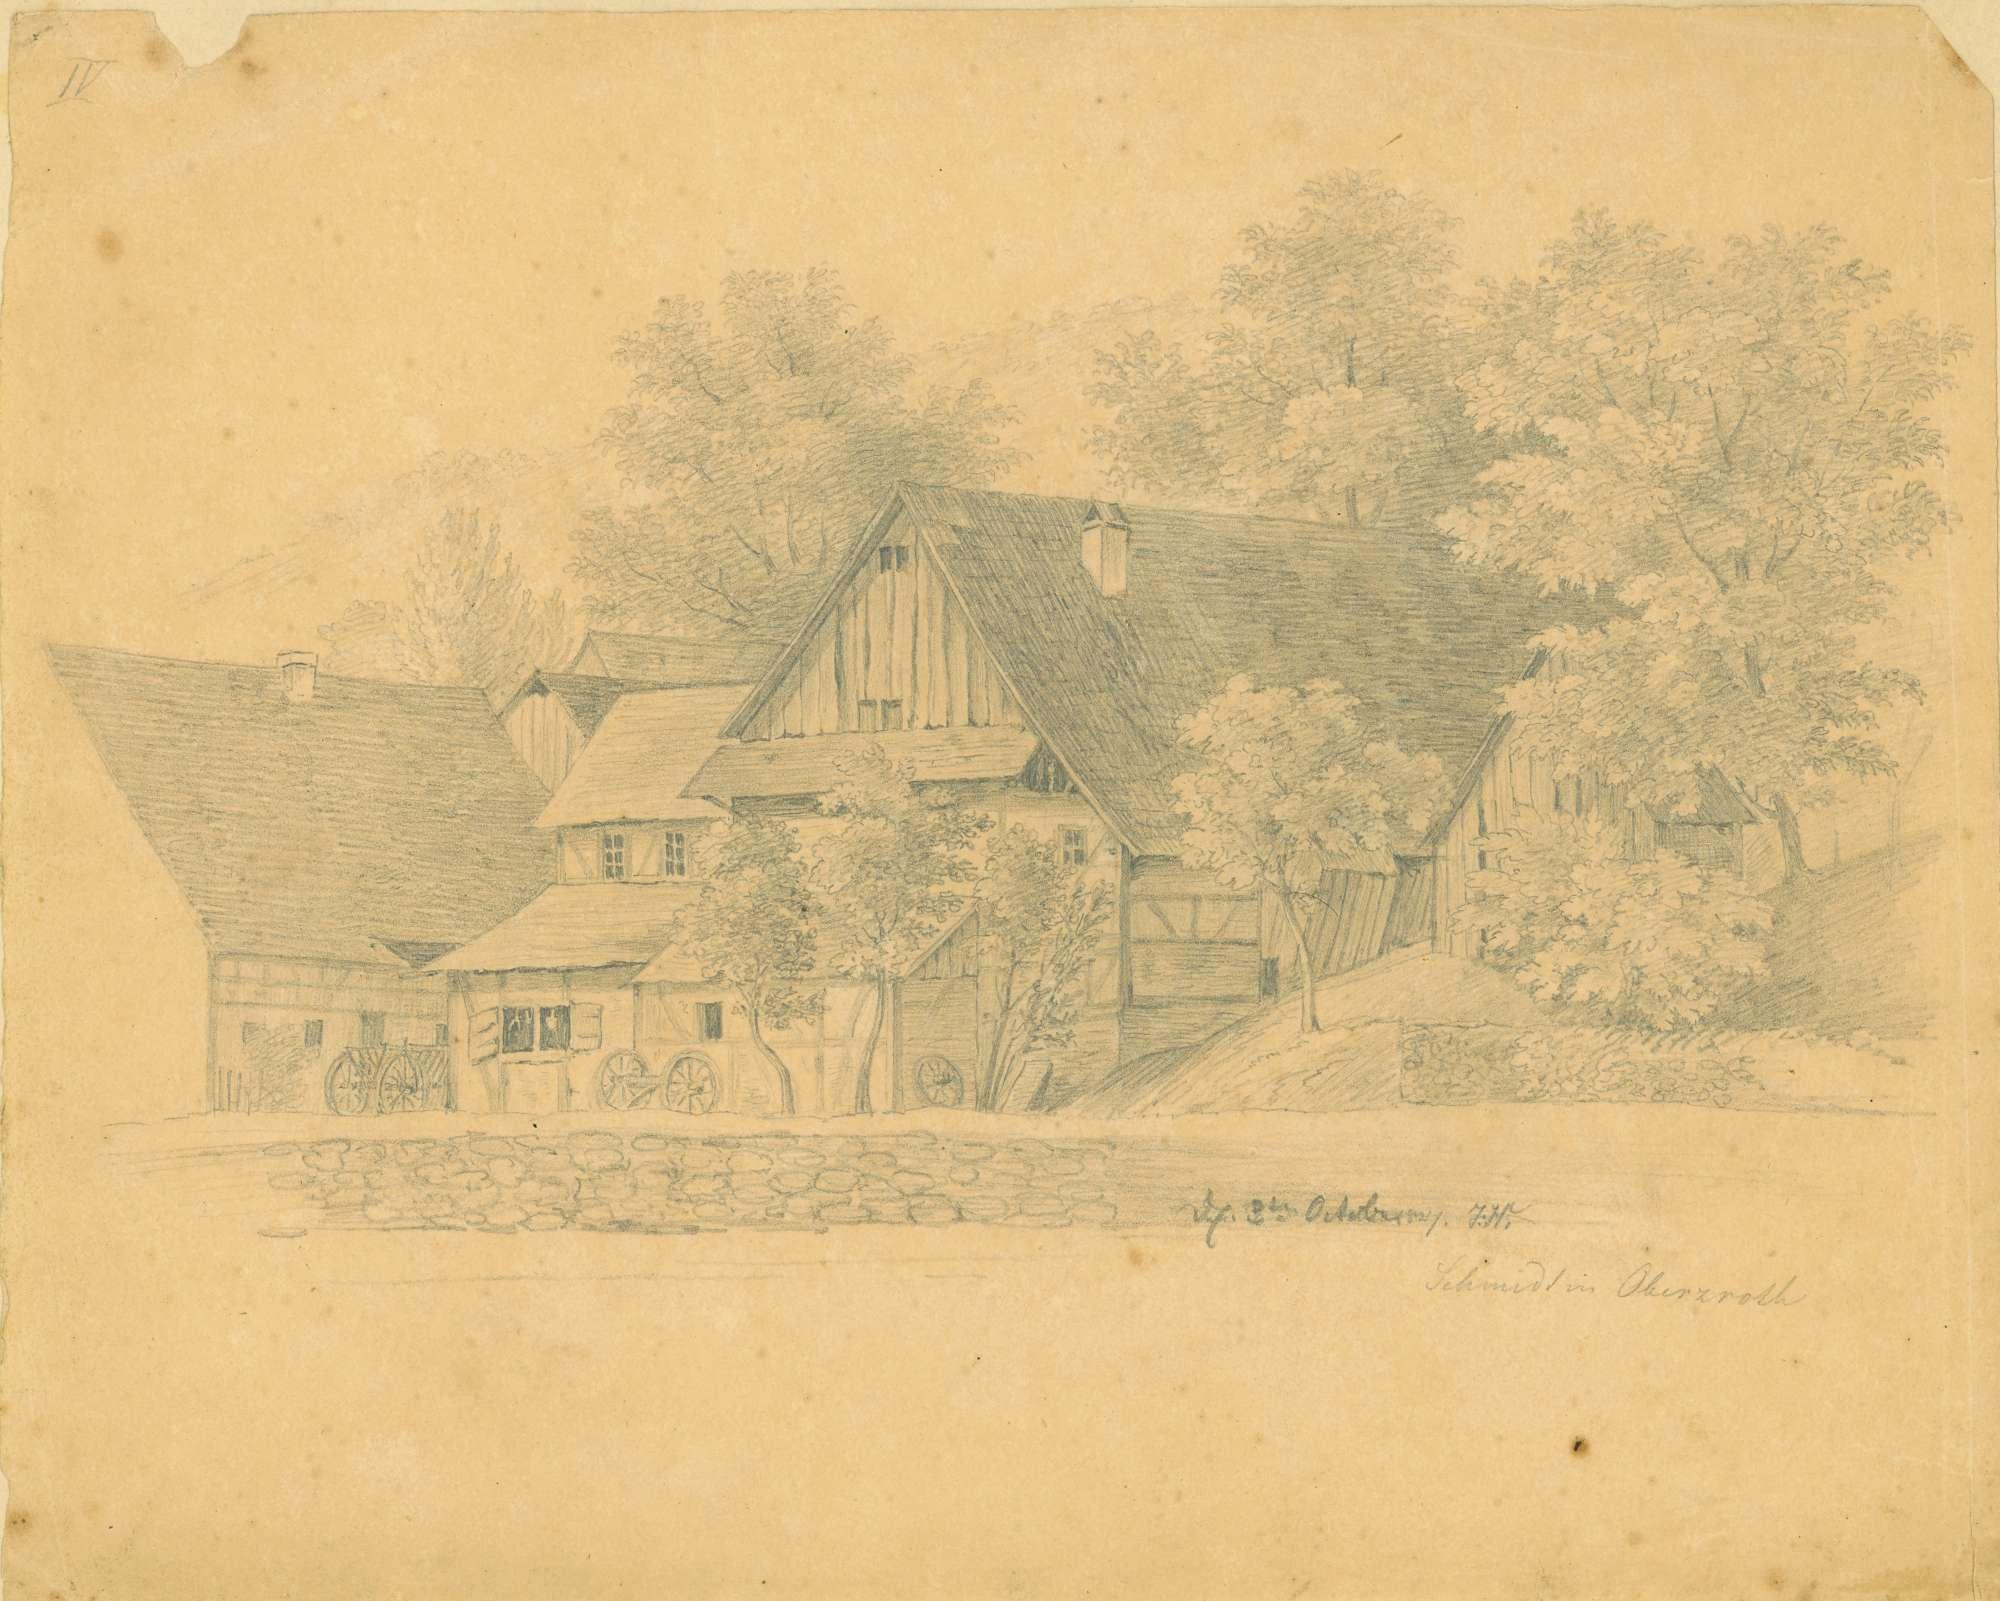 Schmied in Oberzroth, Bild 1